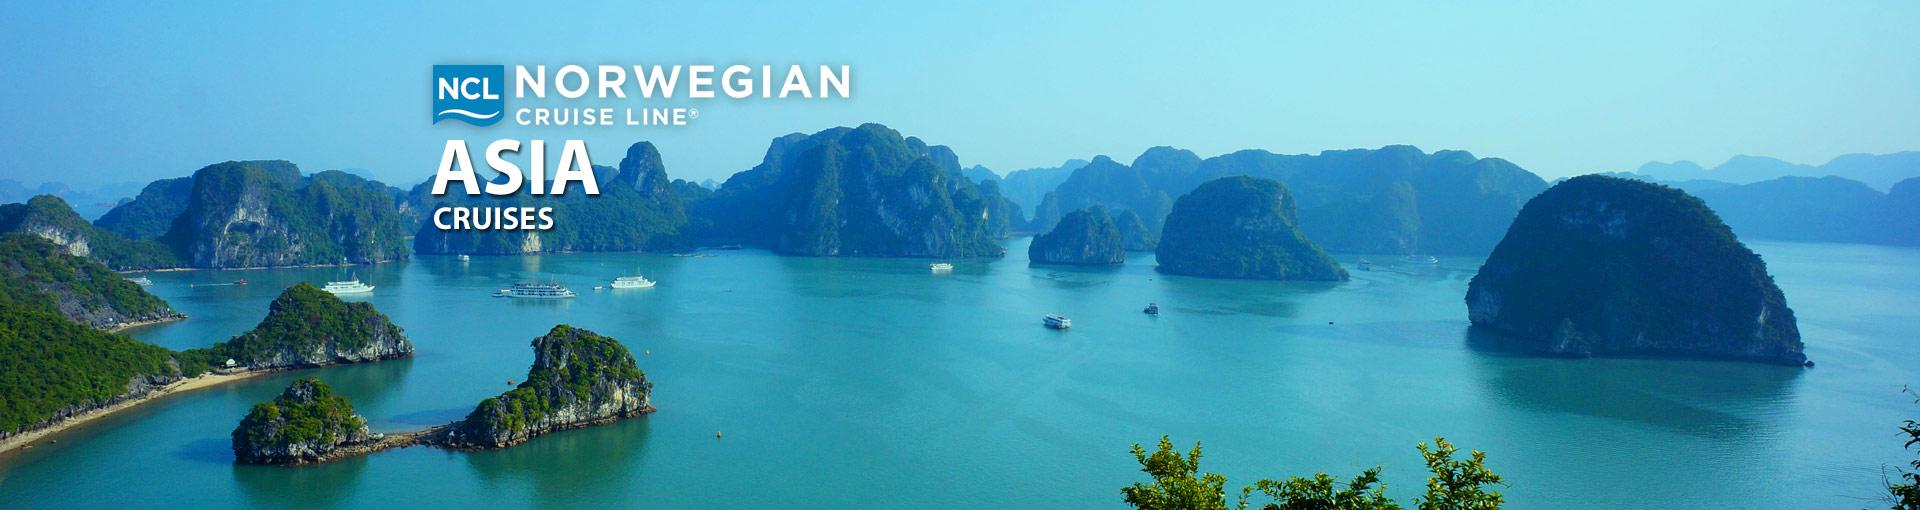 Norwegian Cruise Line Asia Cruises